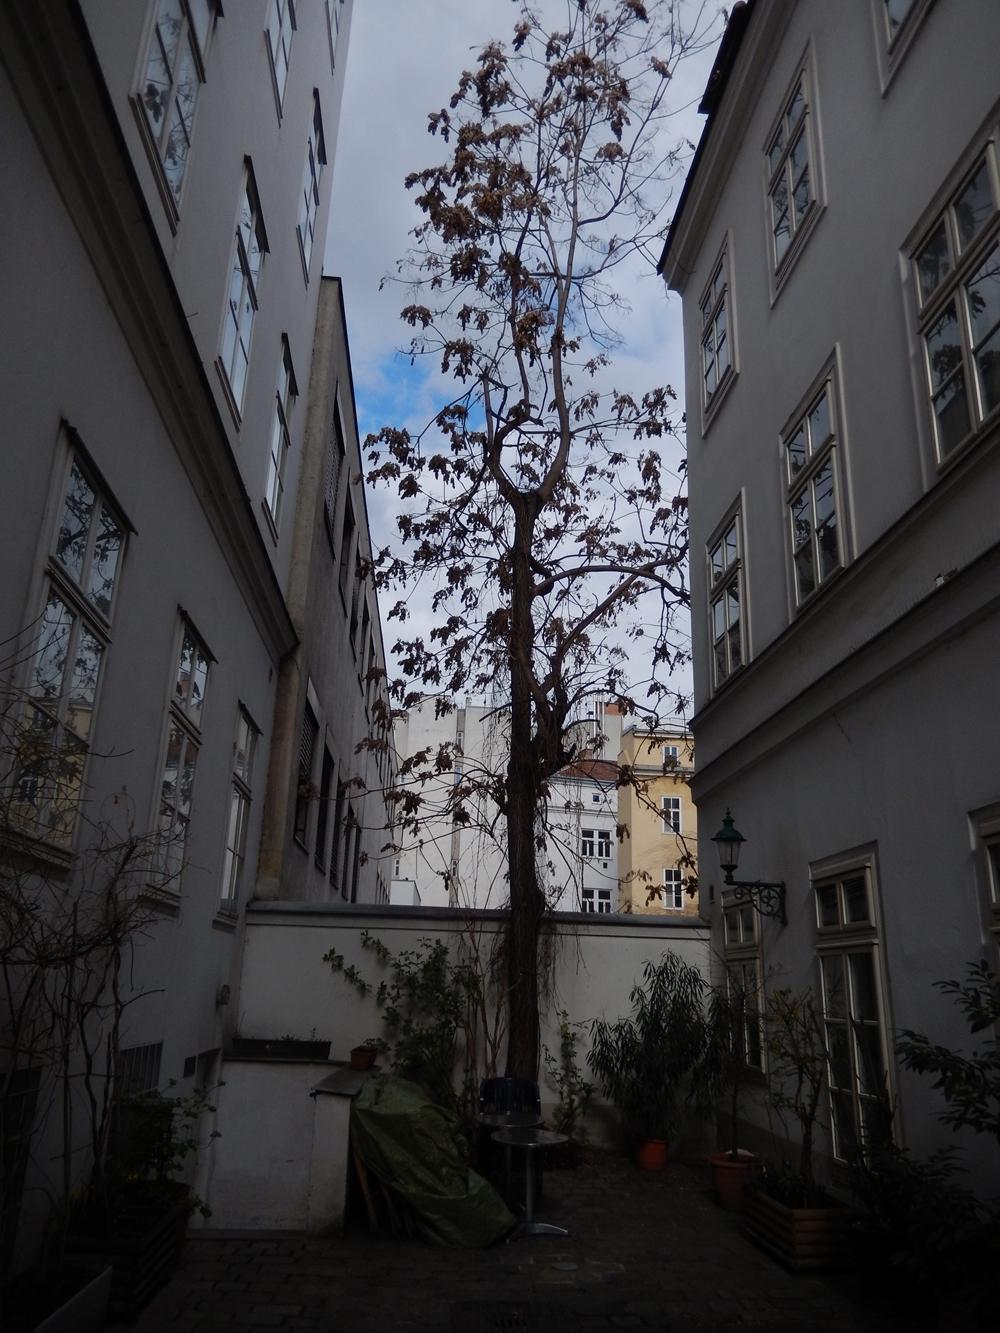 freiwilligerdurchgang wiedeń